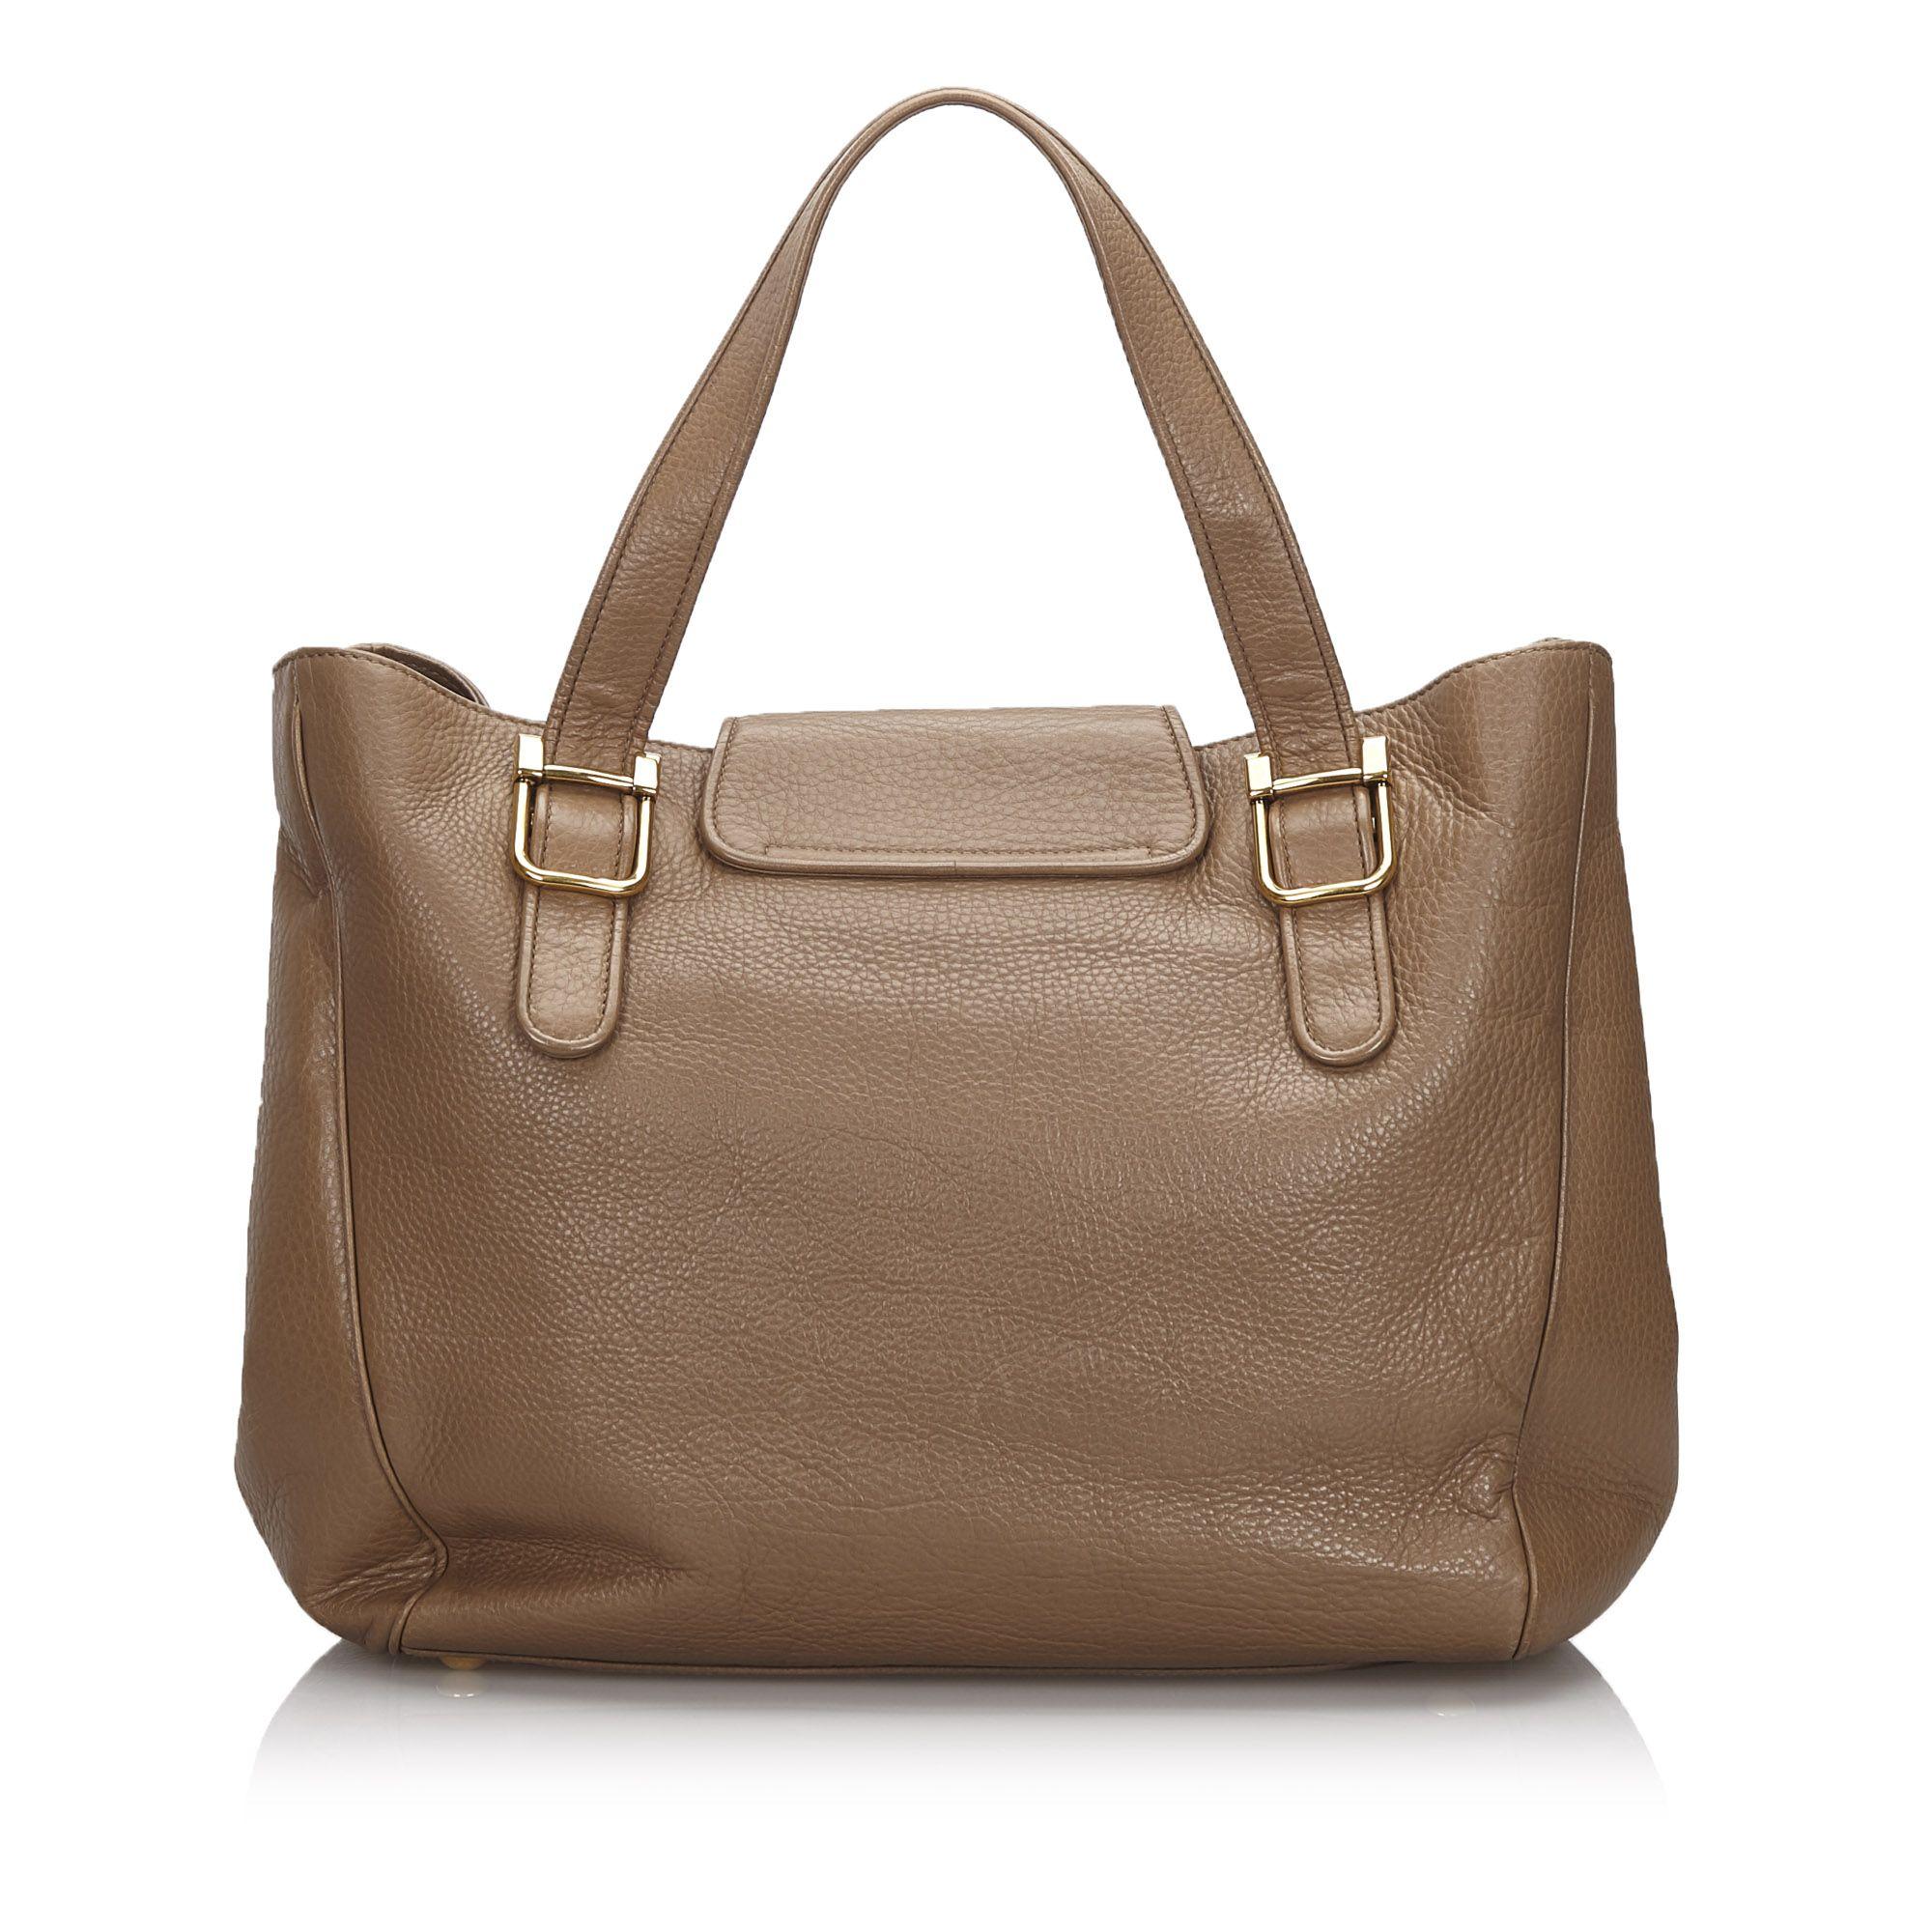 Vintage Gucci 1973 Leather Tote Bag Brown